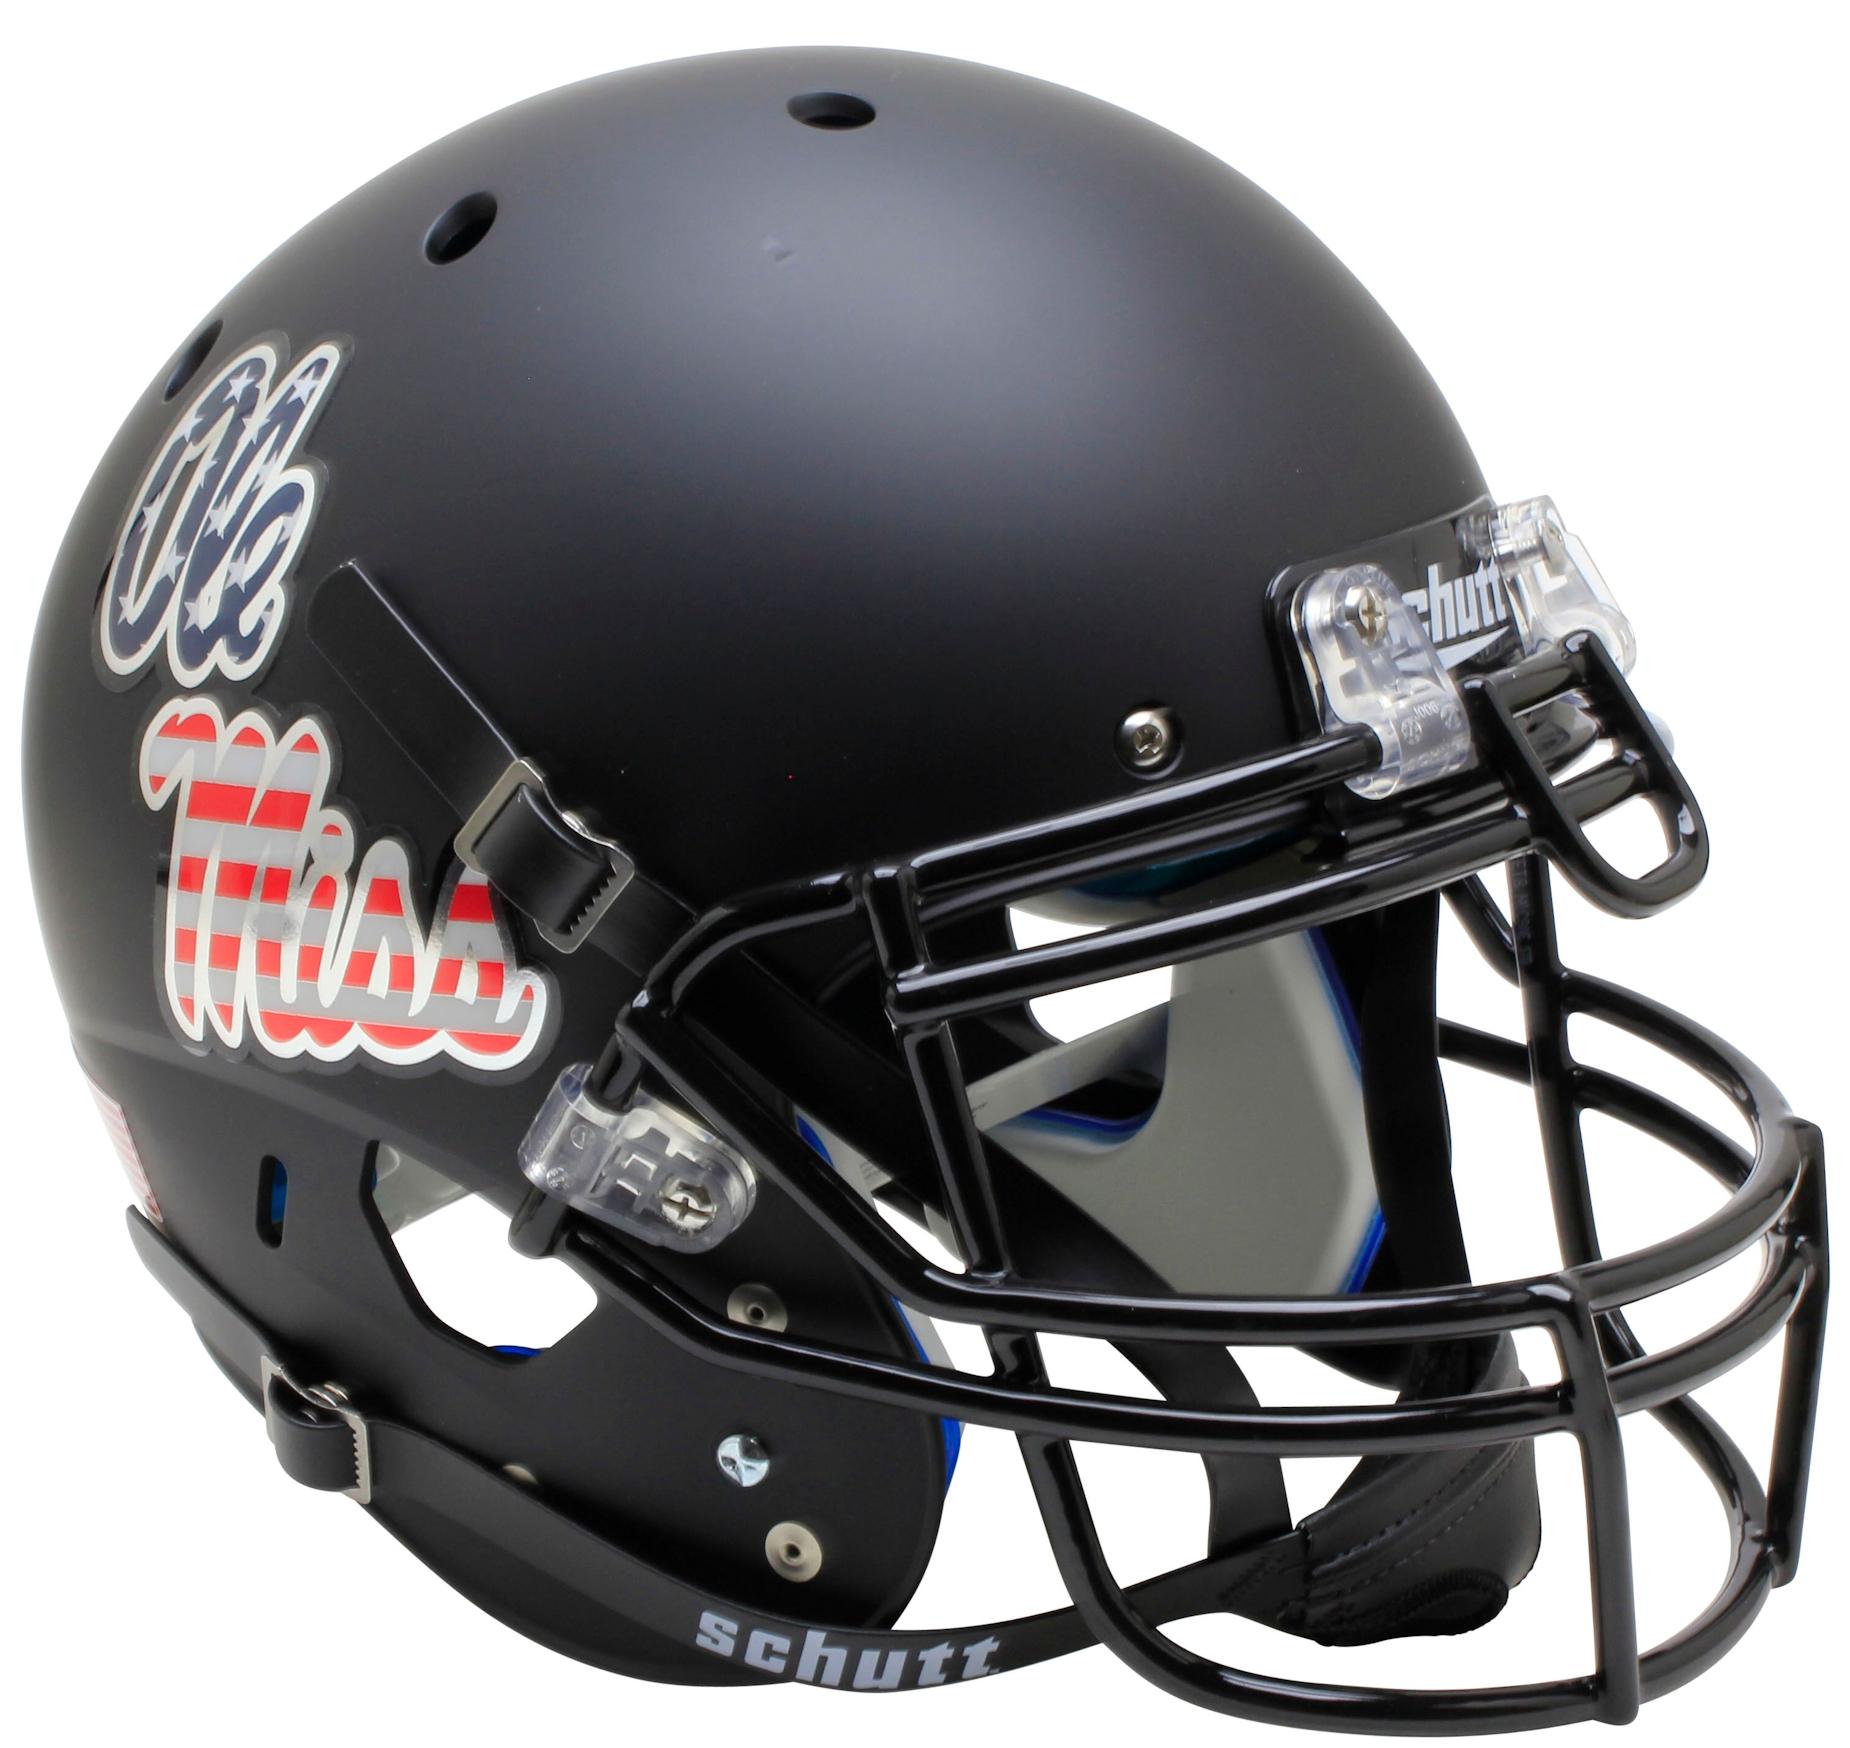 Mississippi (Ole Miss) Rebels Authentic College XP Football Helmet Schutt <B>Patriot Decal</B>